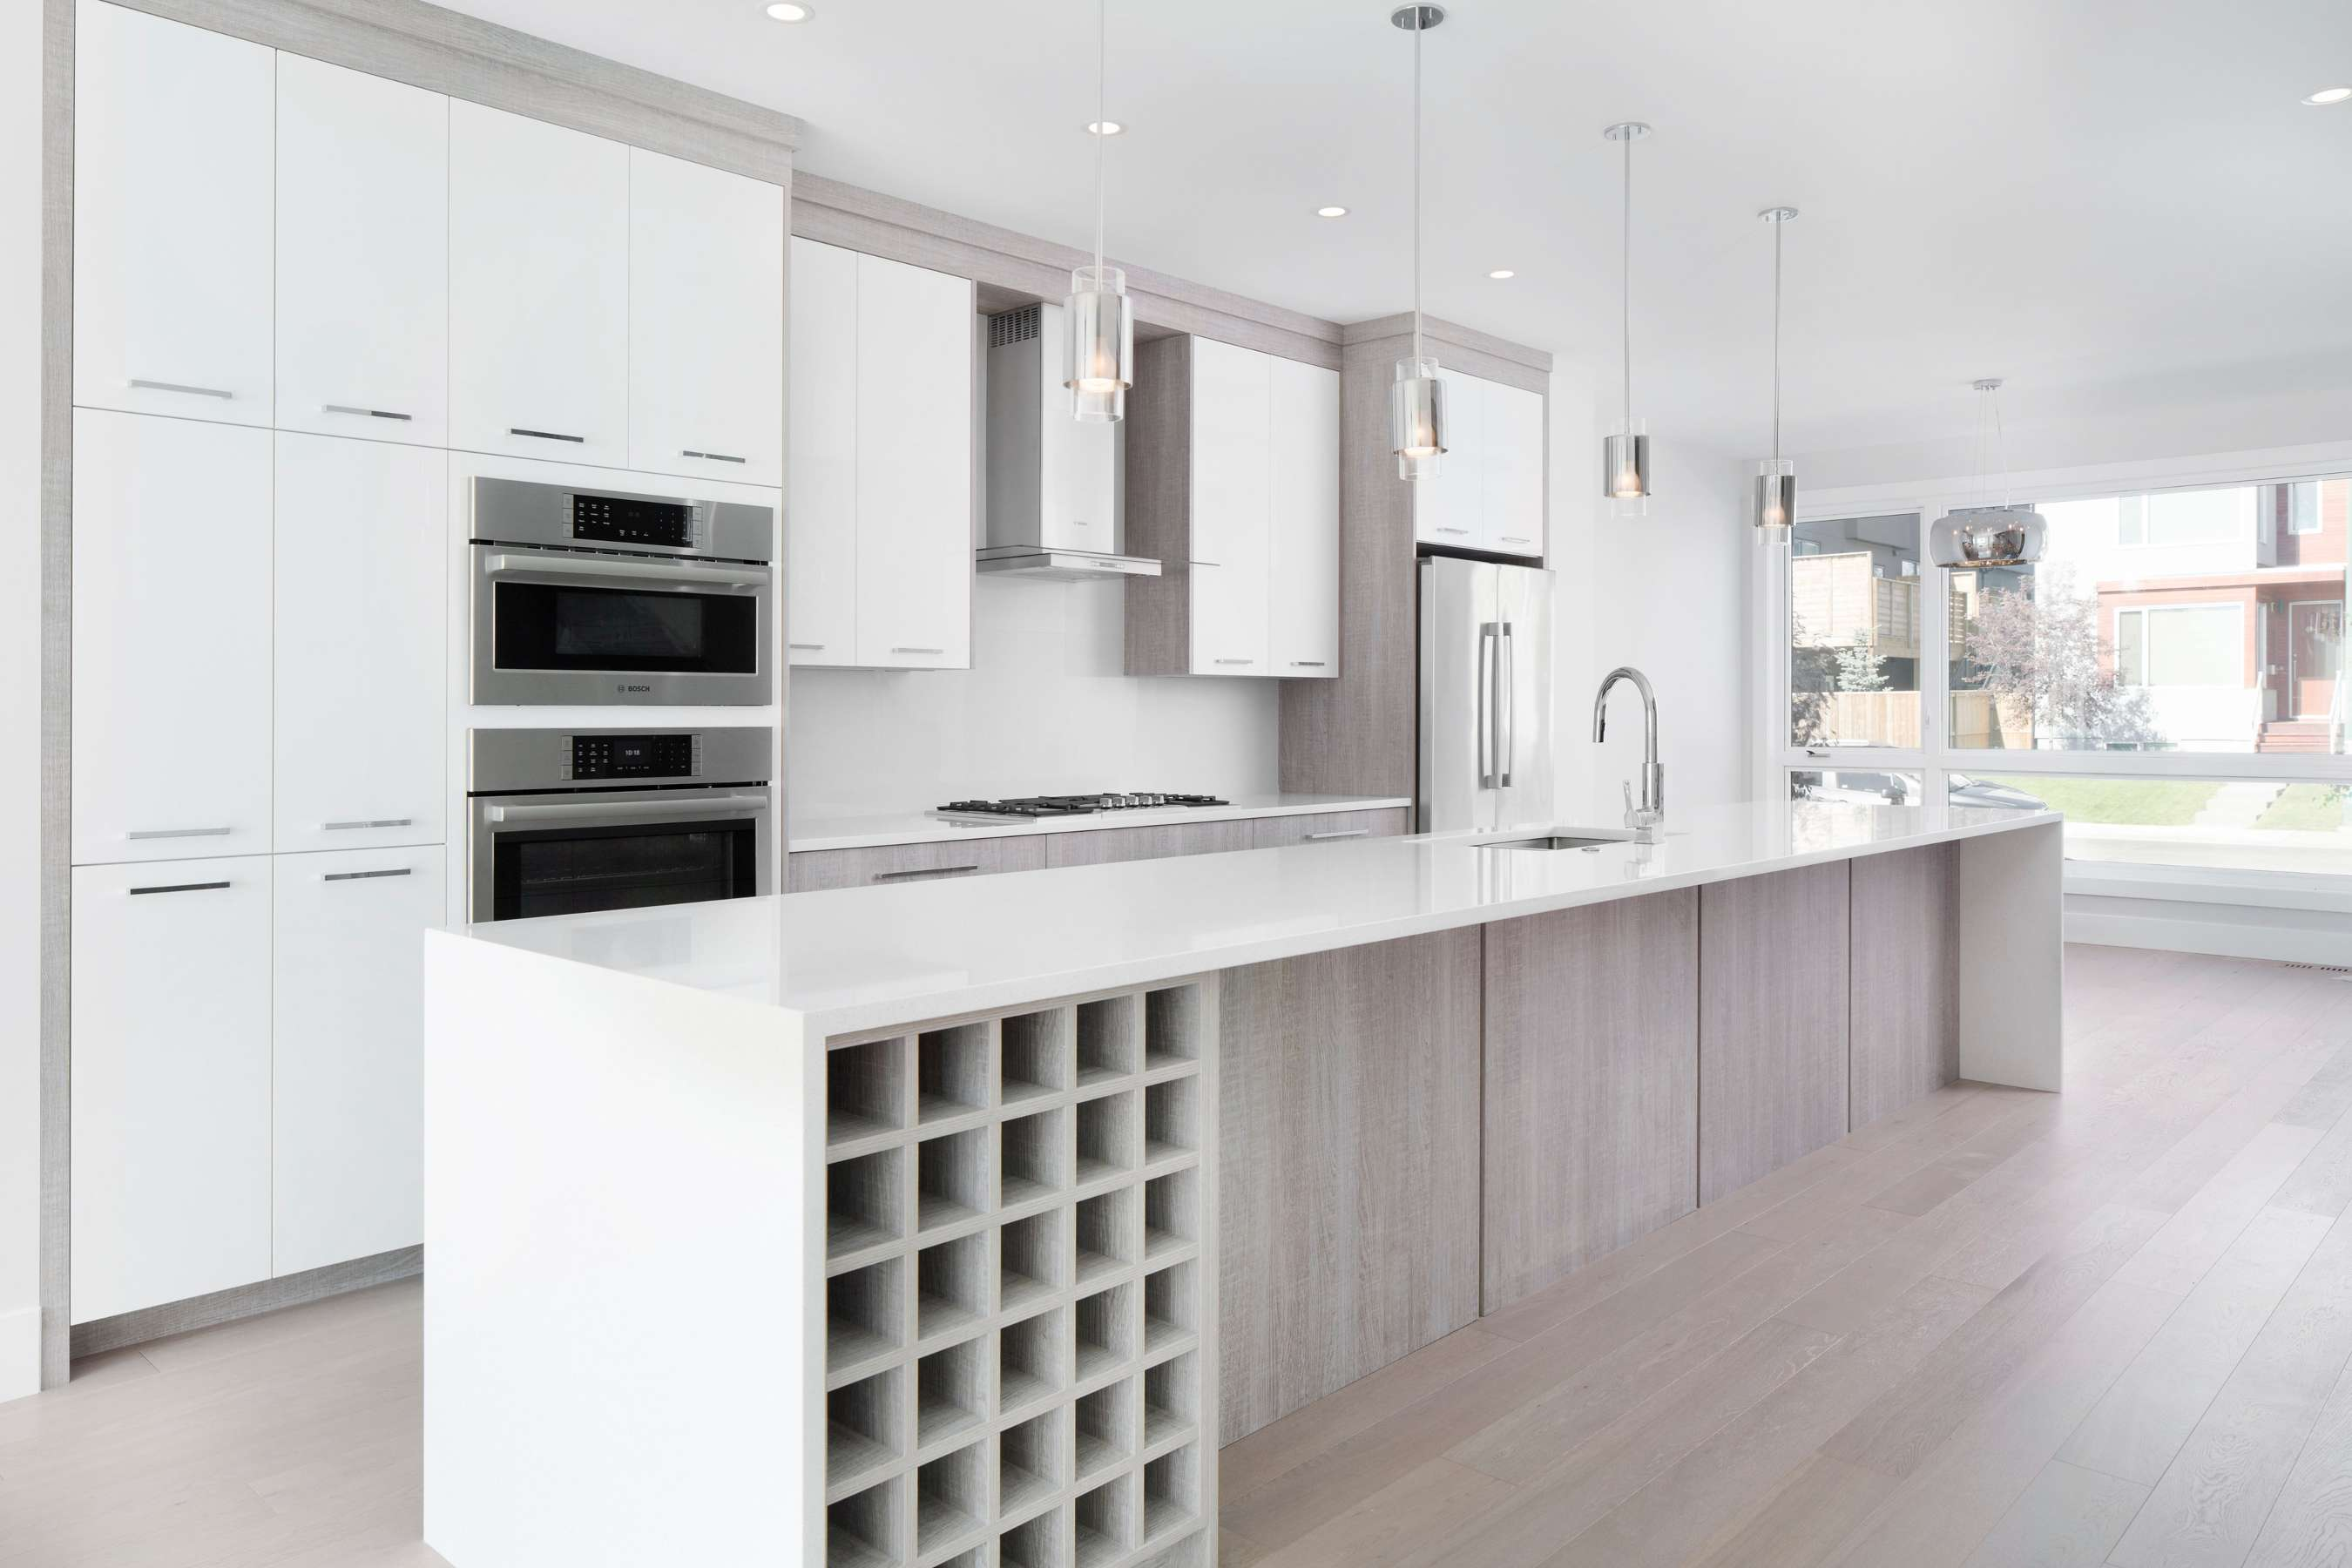 Textured melamine kitchen with high gloss doors